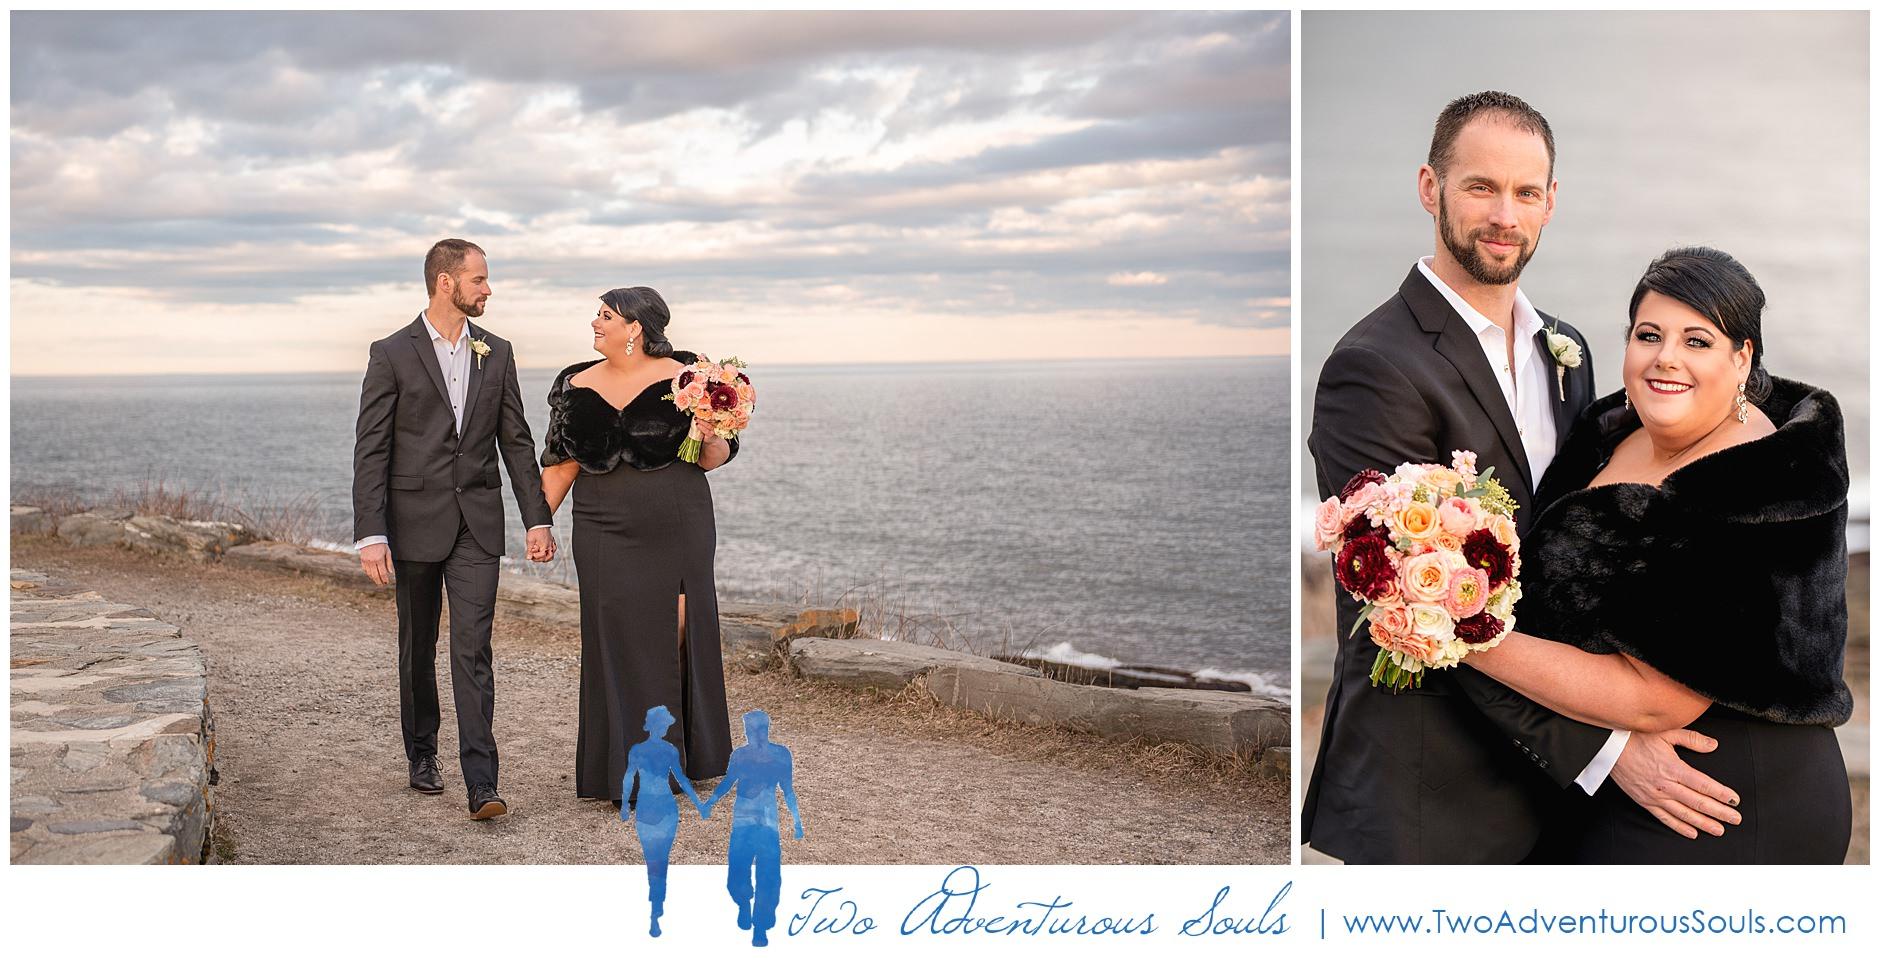 Inn by The Sea Elopement, Maine Elopement Photographer, Maine Wedding Photographers, Two Adventurous Souls_040619_0027.jpg